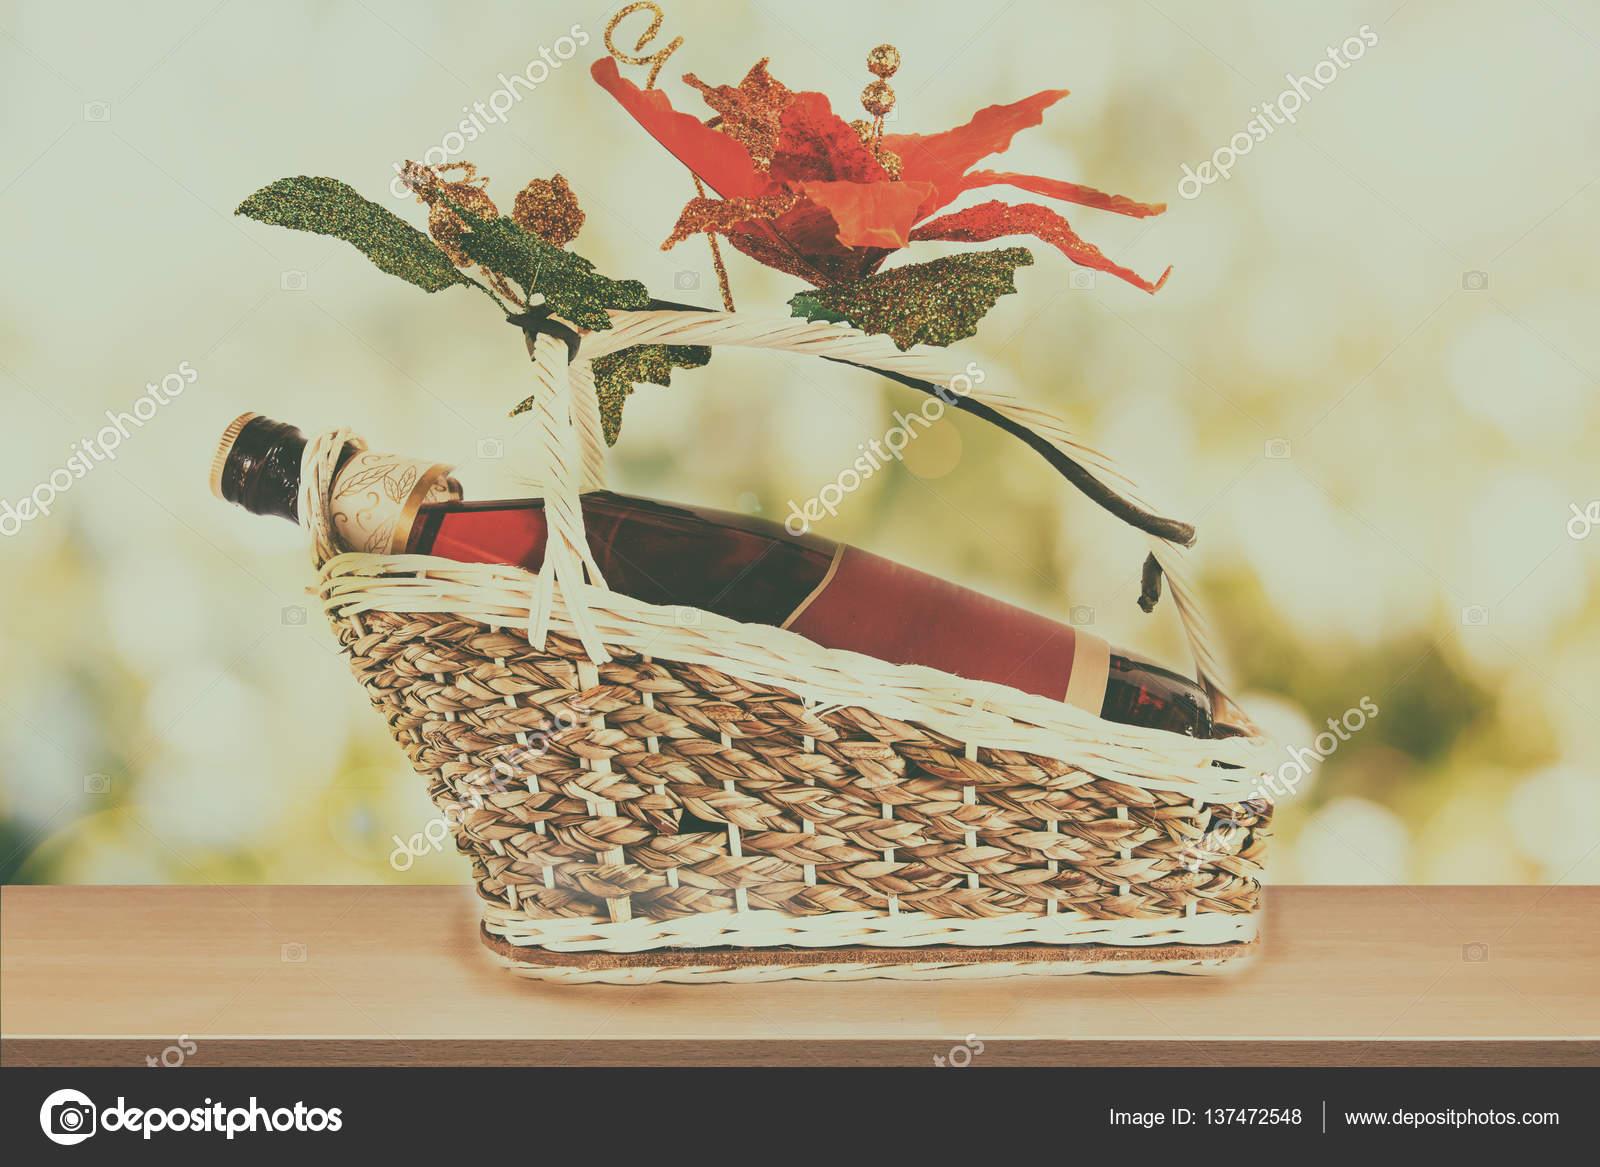 27def20788 Φιάλη κρασιού με κενή ετικέτα παρούσα καλάθι με ψεύτικο λουλούδι σε φύση  και το πράσινο φόντο bokeh ξύλινο τραπέζι για προβολή προϊόντος — Εικόνα  από ...